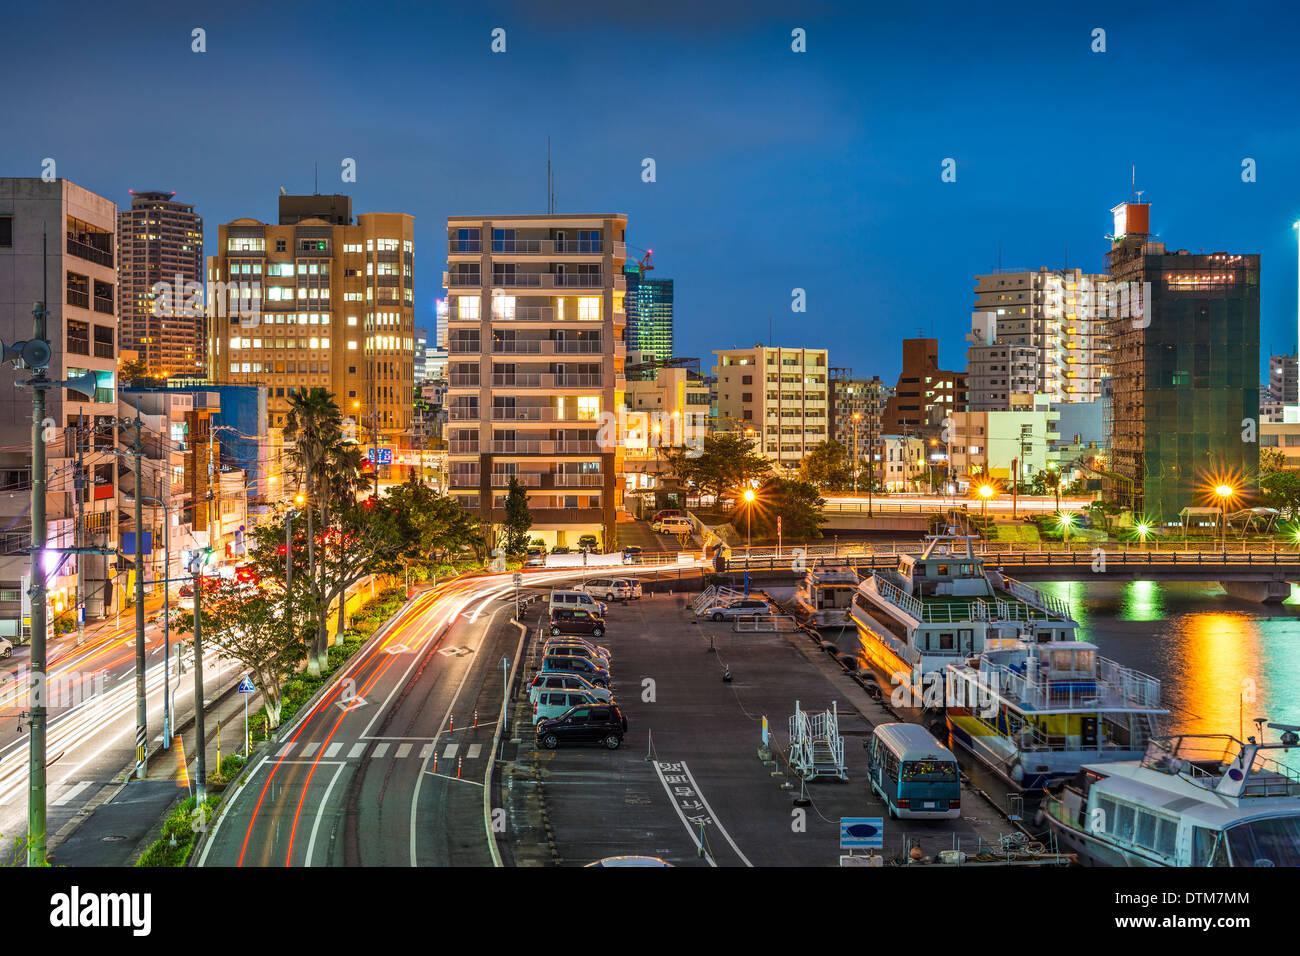 Naha, Okinawa, Japón skyline en el puerto. Imagen De Stock